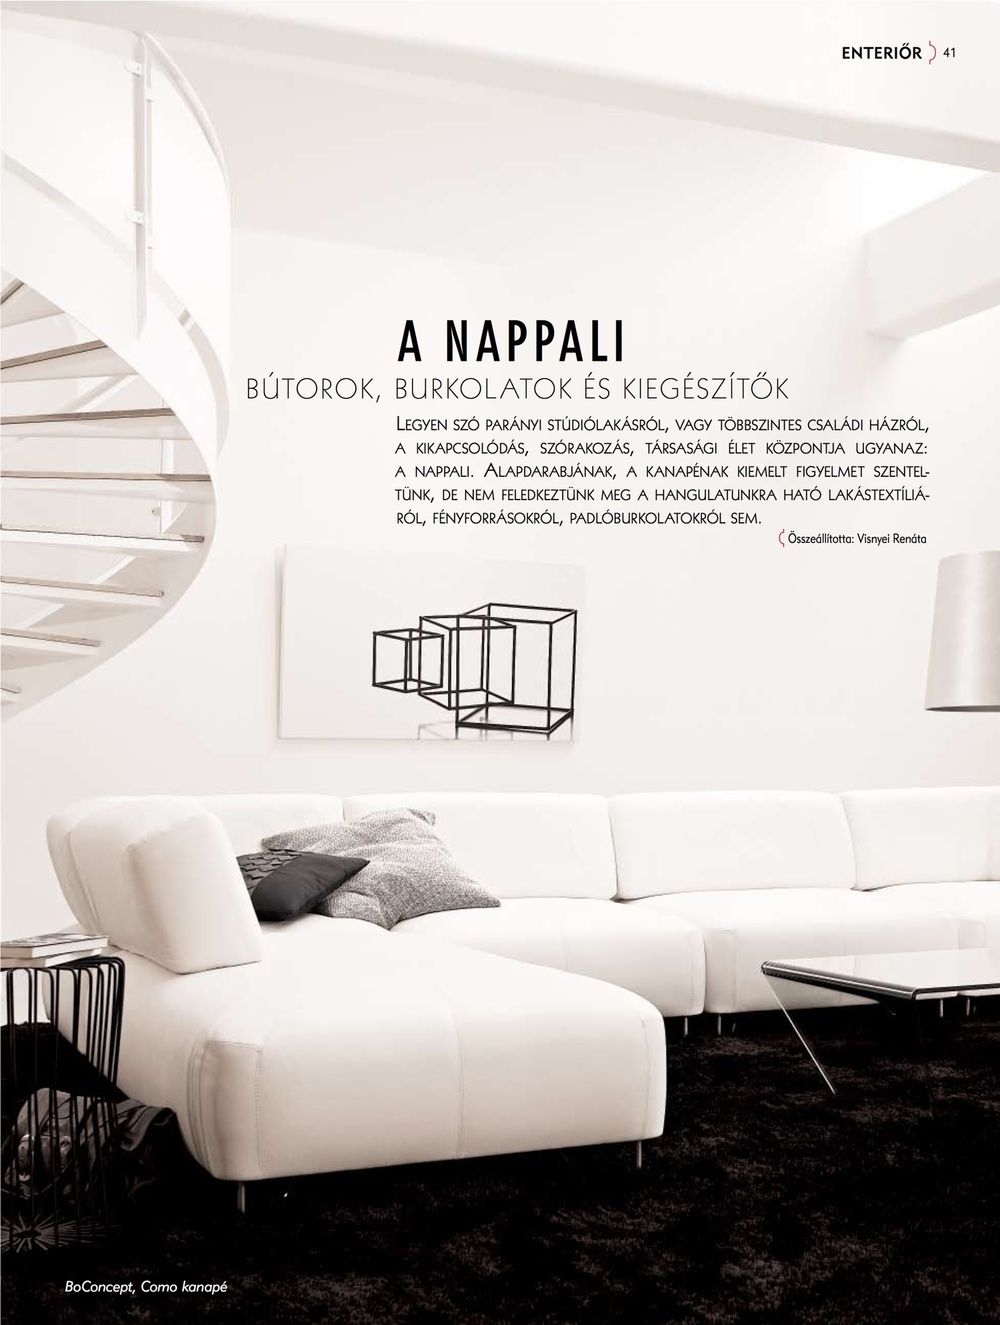 Nappali, A mi otthonunk, 2009. március